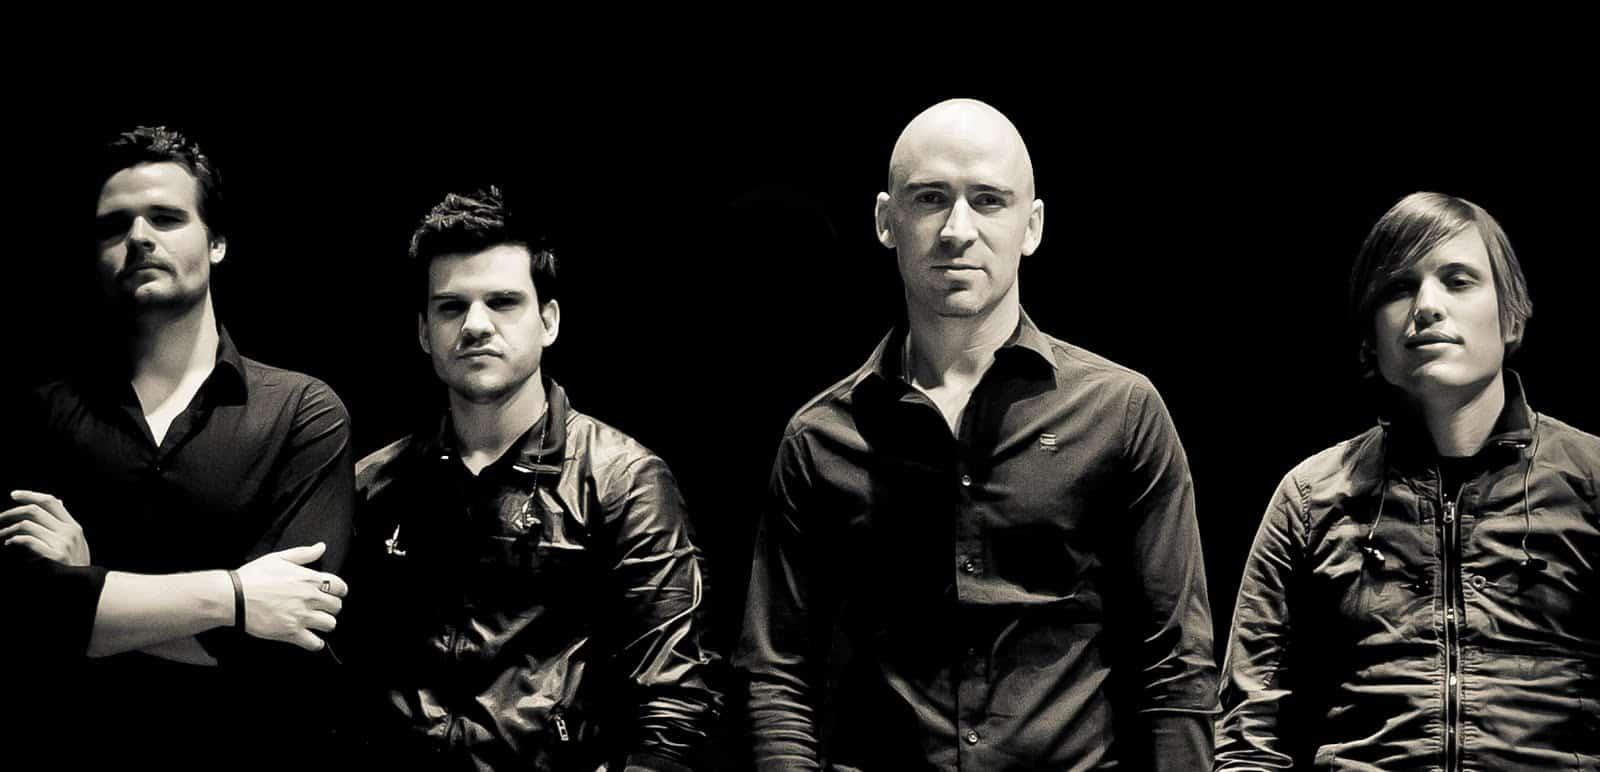 Live – 90's band